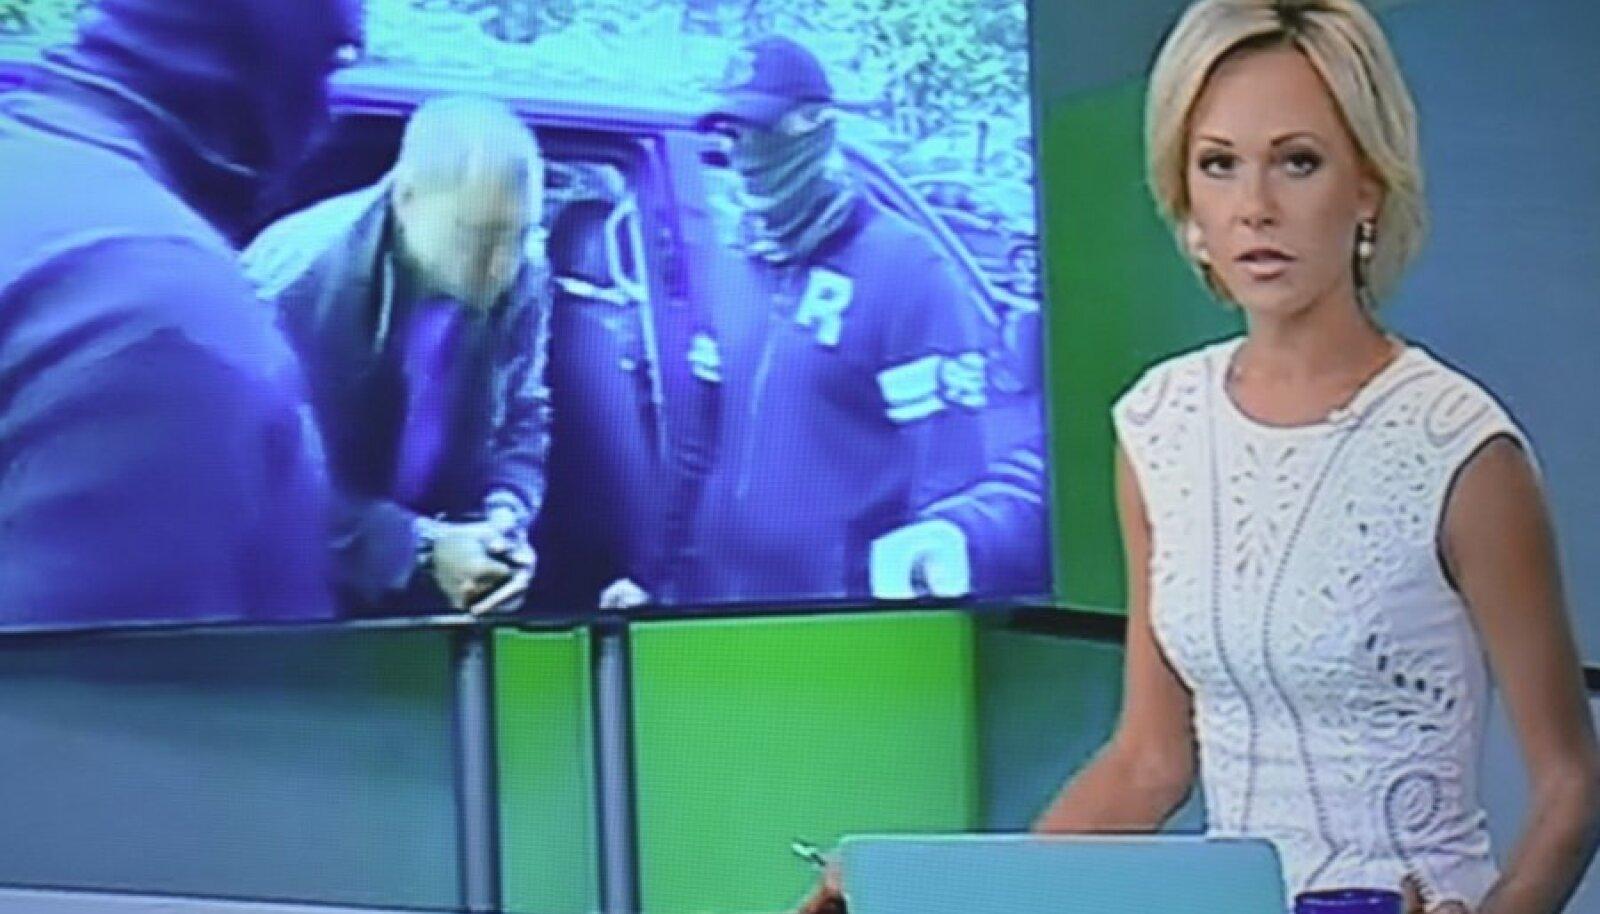 Eston Kohver detained in Russia